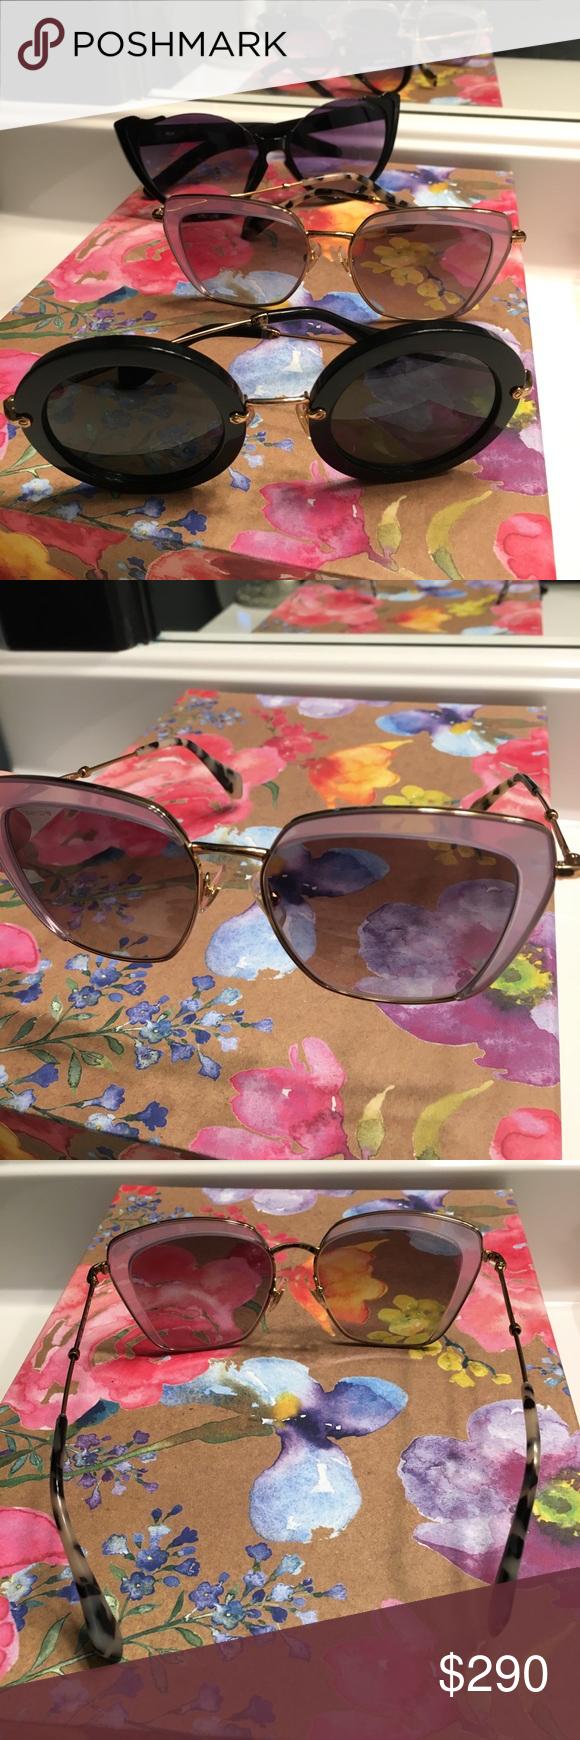 6db62eaab749 3 Pairs of Authentic MIU MIU sunglasses Three beautiful pairs of authentic Miu  Miu glasses.